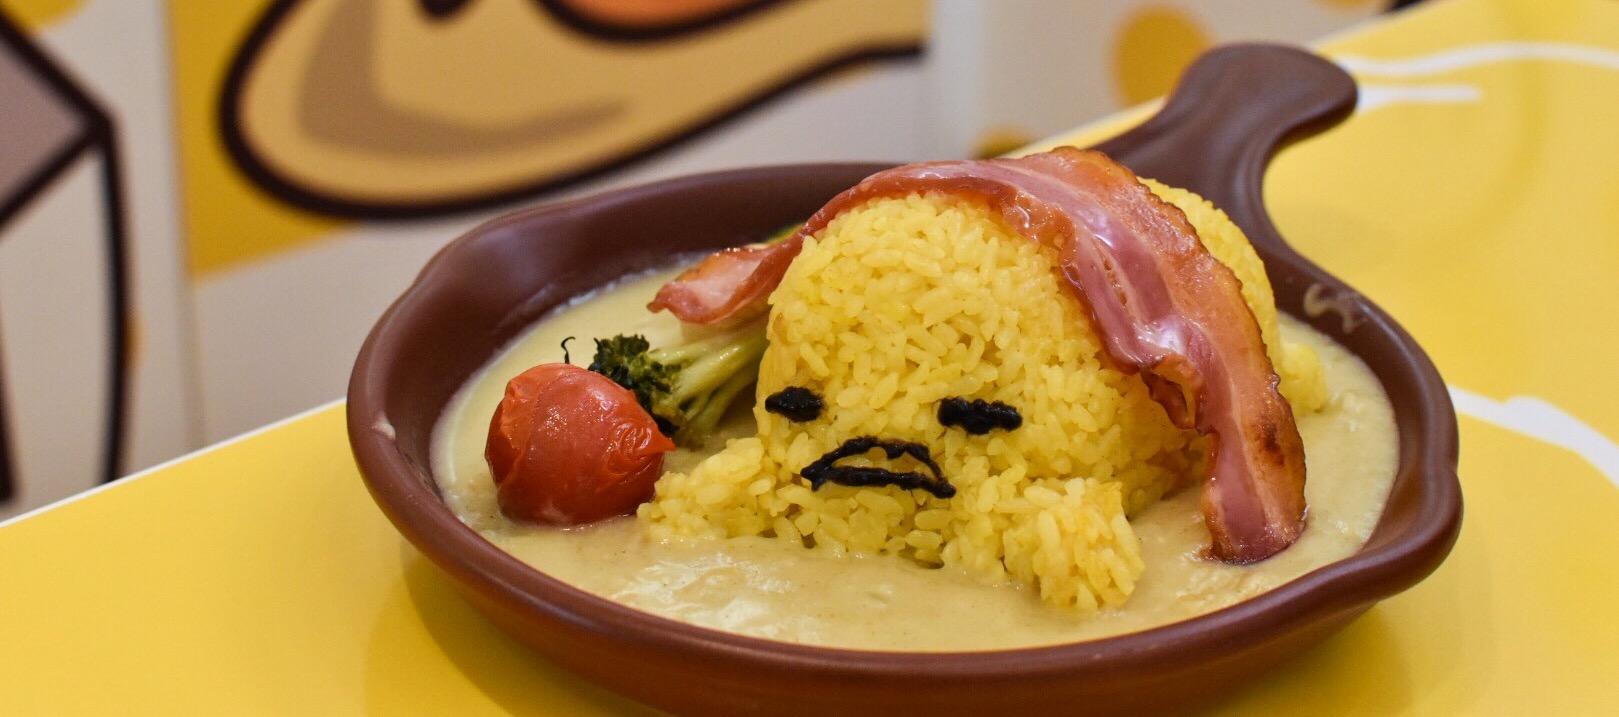 Whole pudding Turn Gudetama eggs japan